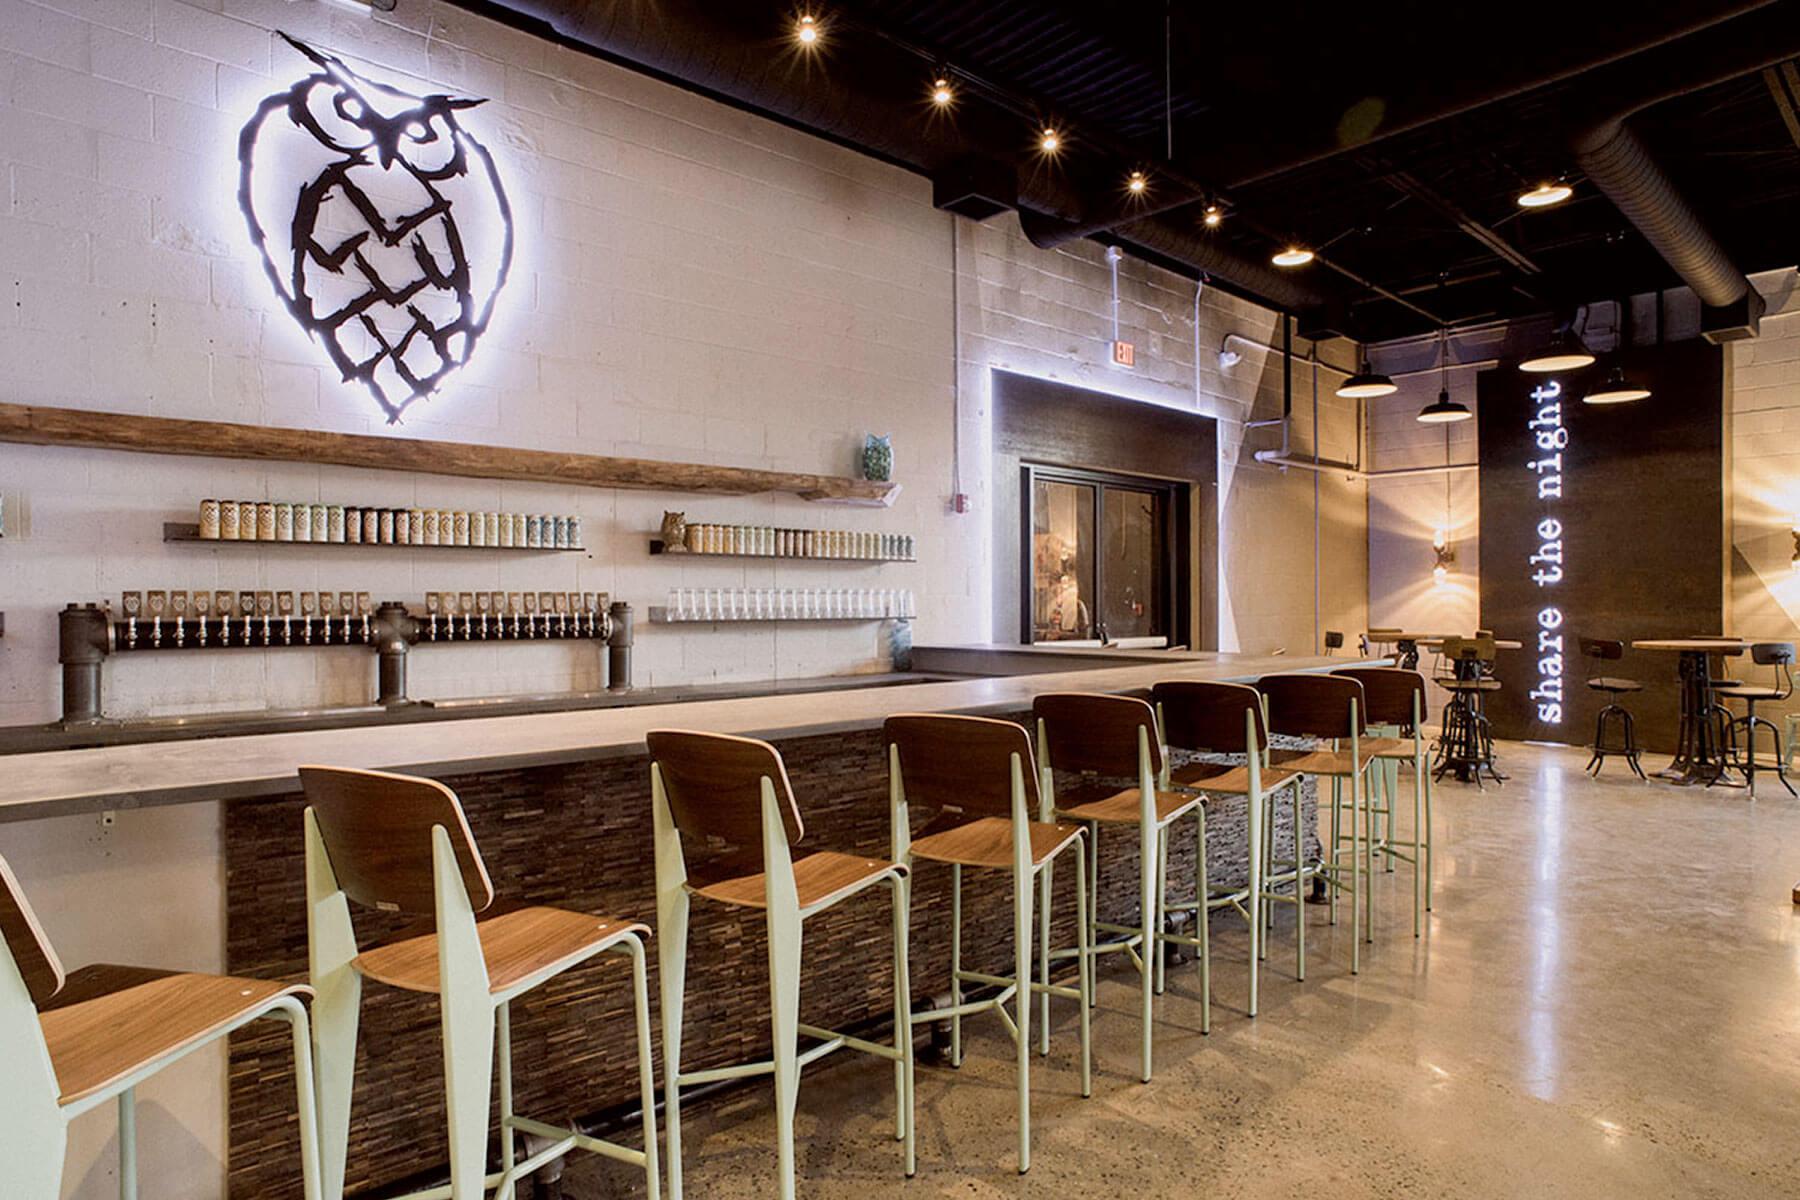 Inside the Night Shift Brewing Taproom in Boston, Massachusetts